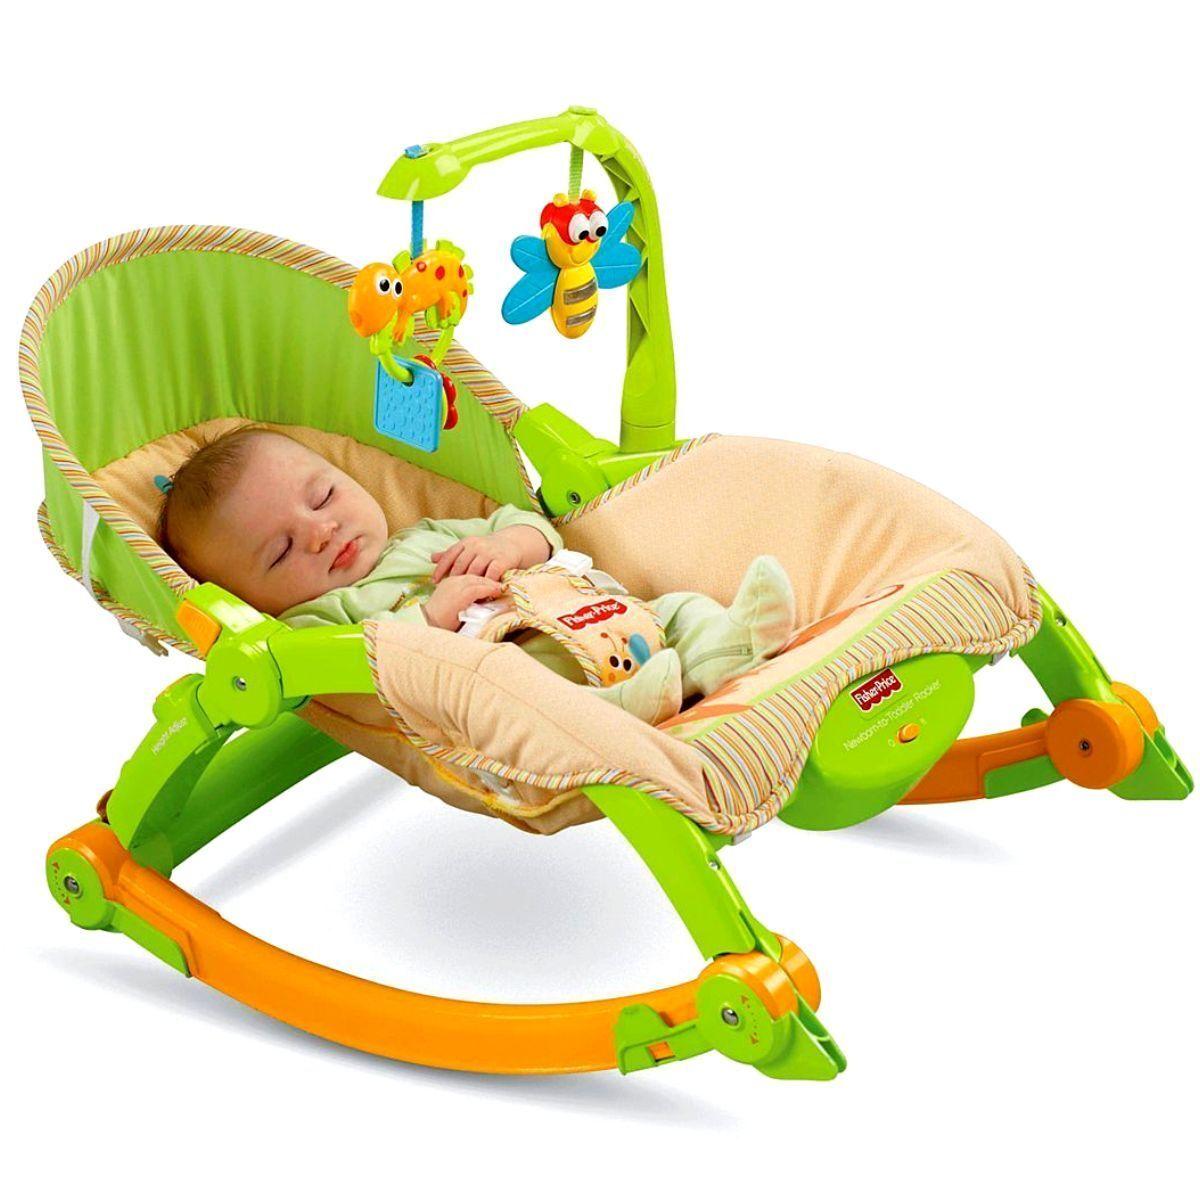 Rocking Baby Sleeper Bassinet Cradle Newborn Crib Bed Basket